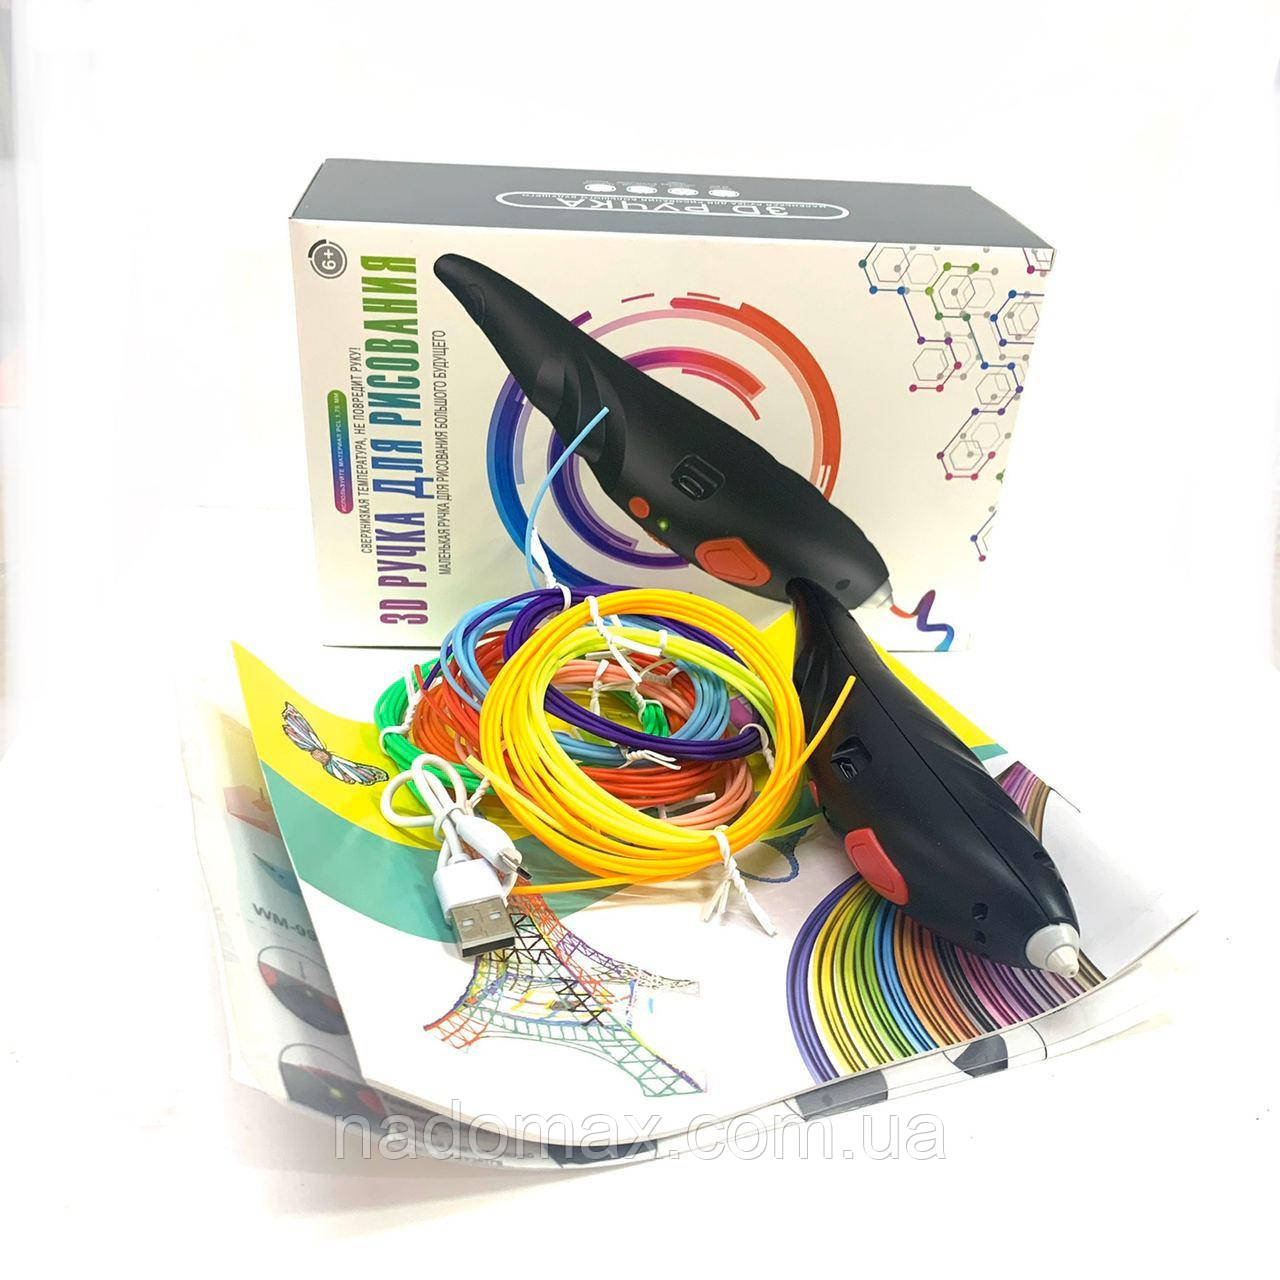 3D ручка на аккумуляторе с трафаретом 9902